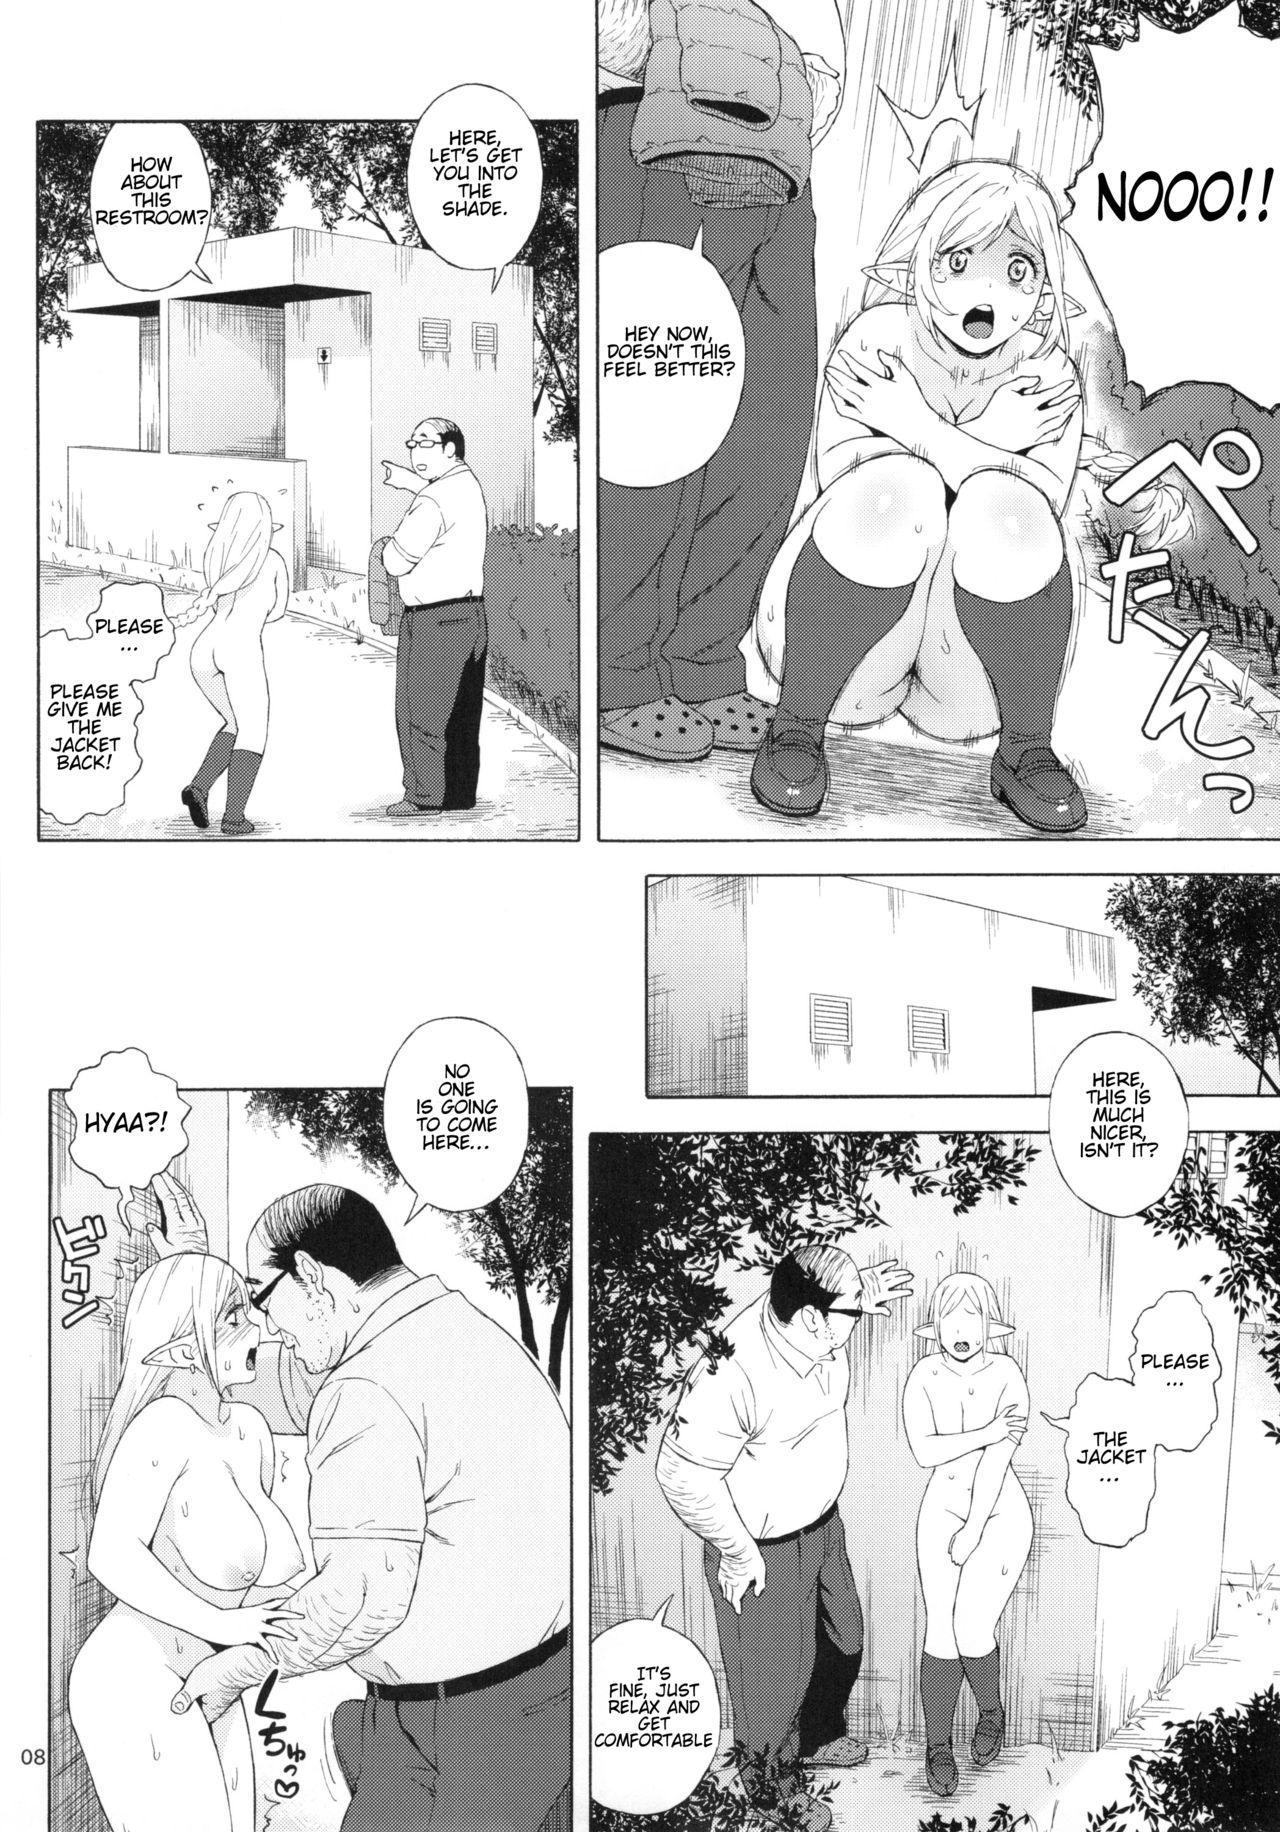 (C92) [666PROTECT (Jingrock)] Tenkousei JK Elf 3 -Houkago Yagai Jugyou- | High School Elven Transfer Student -After School Outdoor Lessons- [English] [Tremalkinger] 7